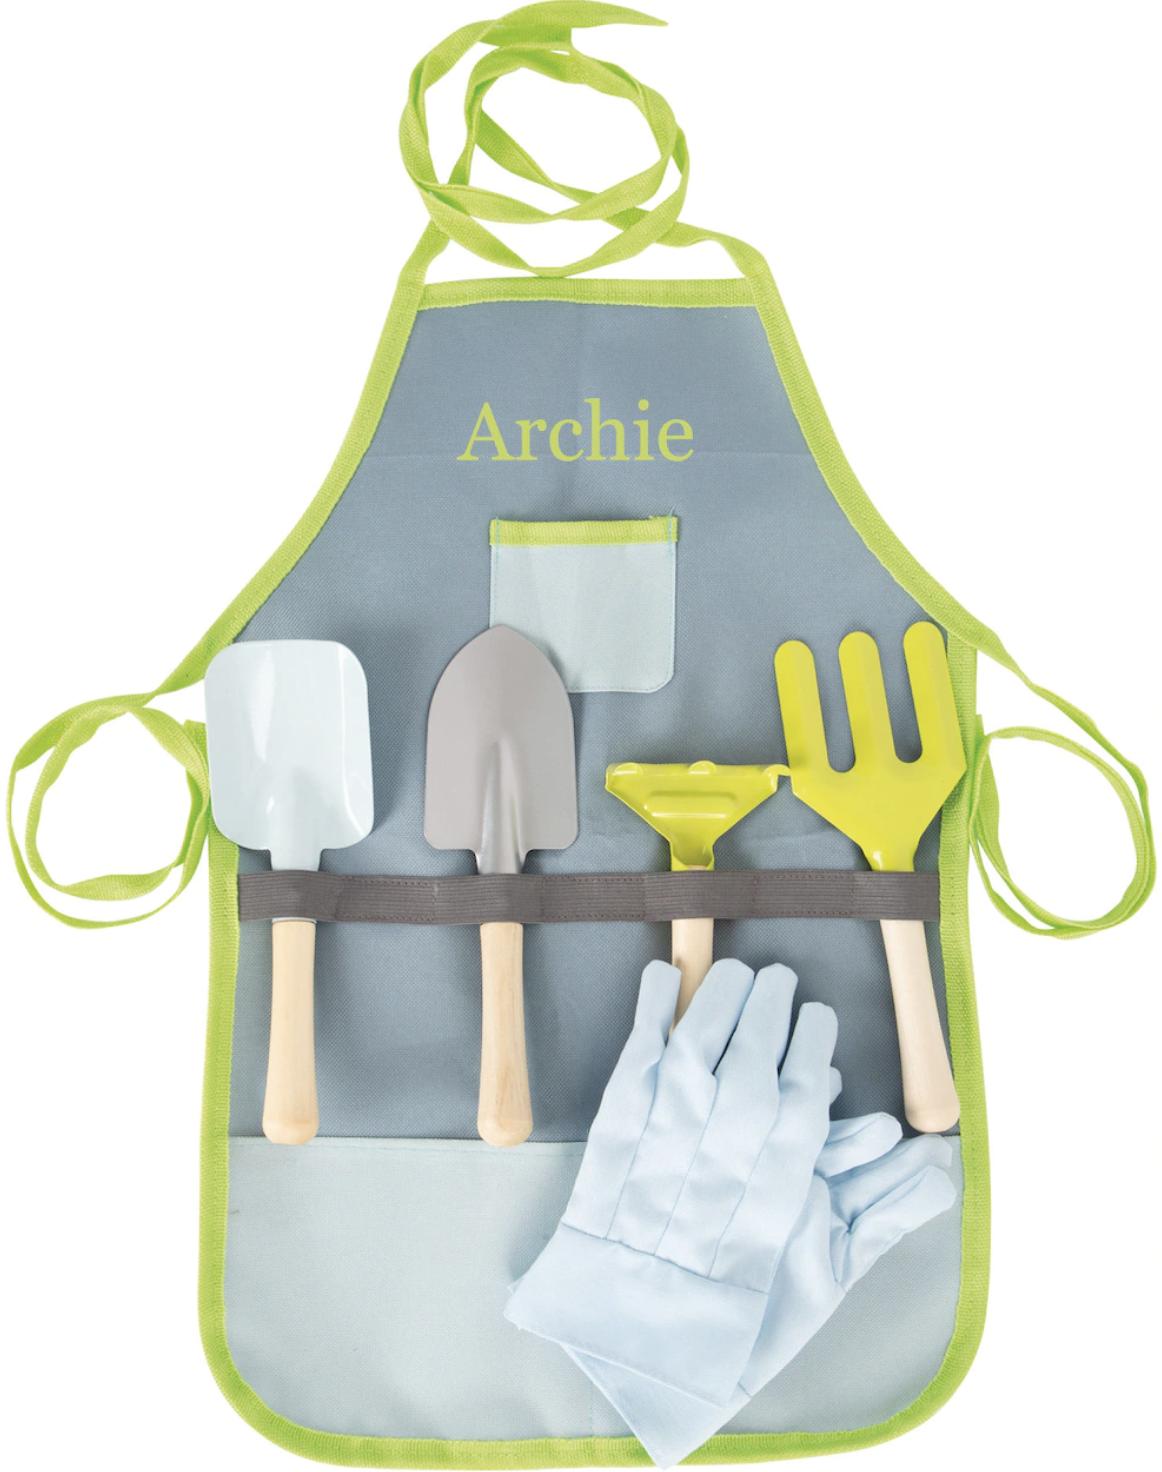 Personalised Kids Gardening Tool Set with Apron